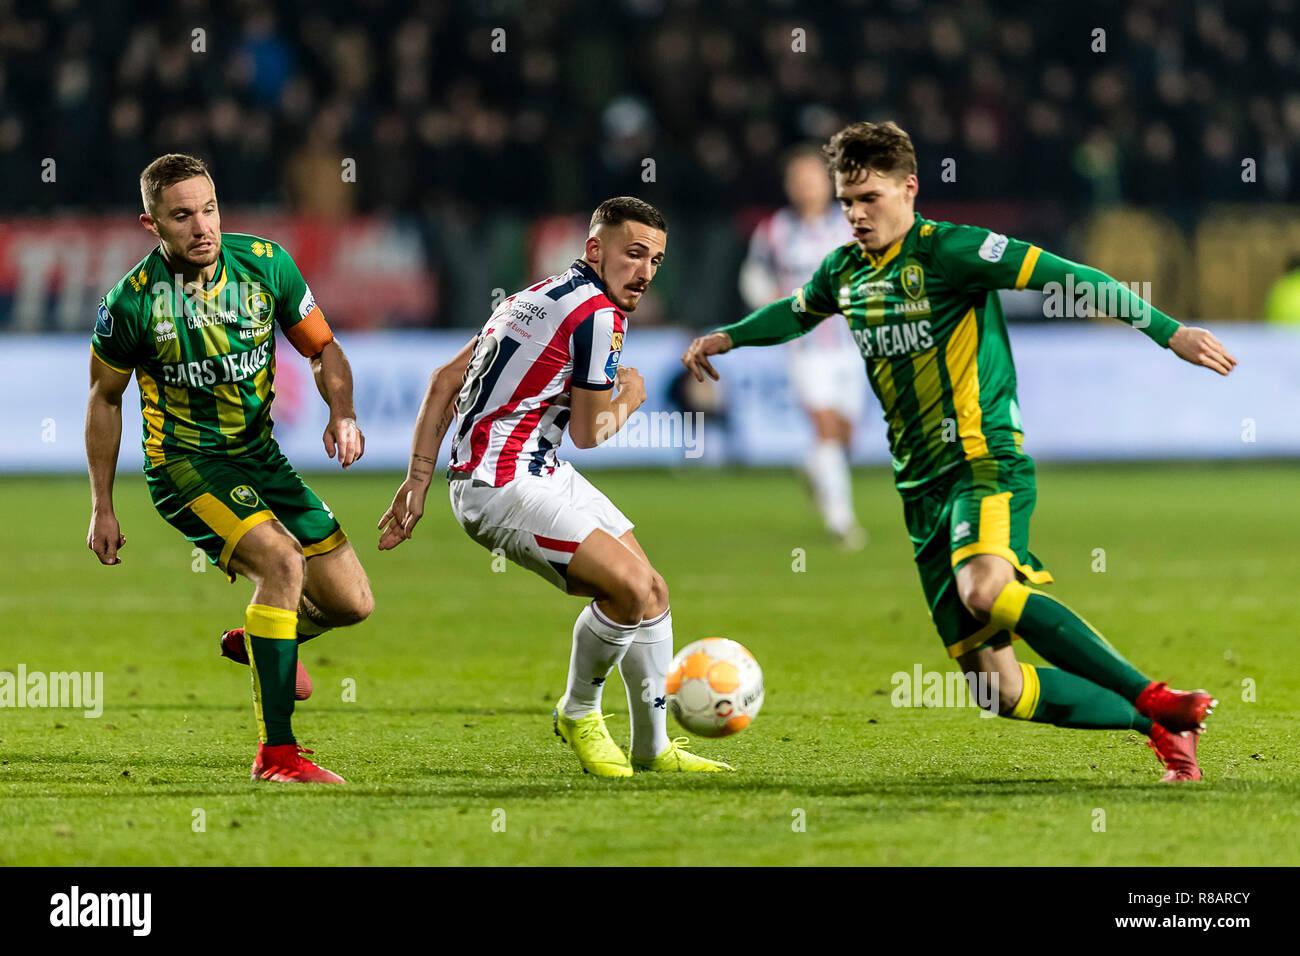 Tilburg 14 12 2018 Koning Willem Ii Stadion Dutch Football Eredivisie Season 2018 2019 Left Right